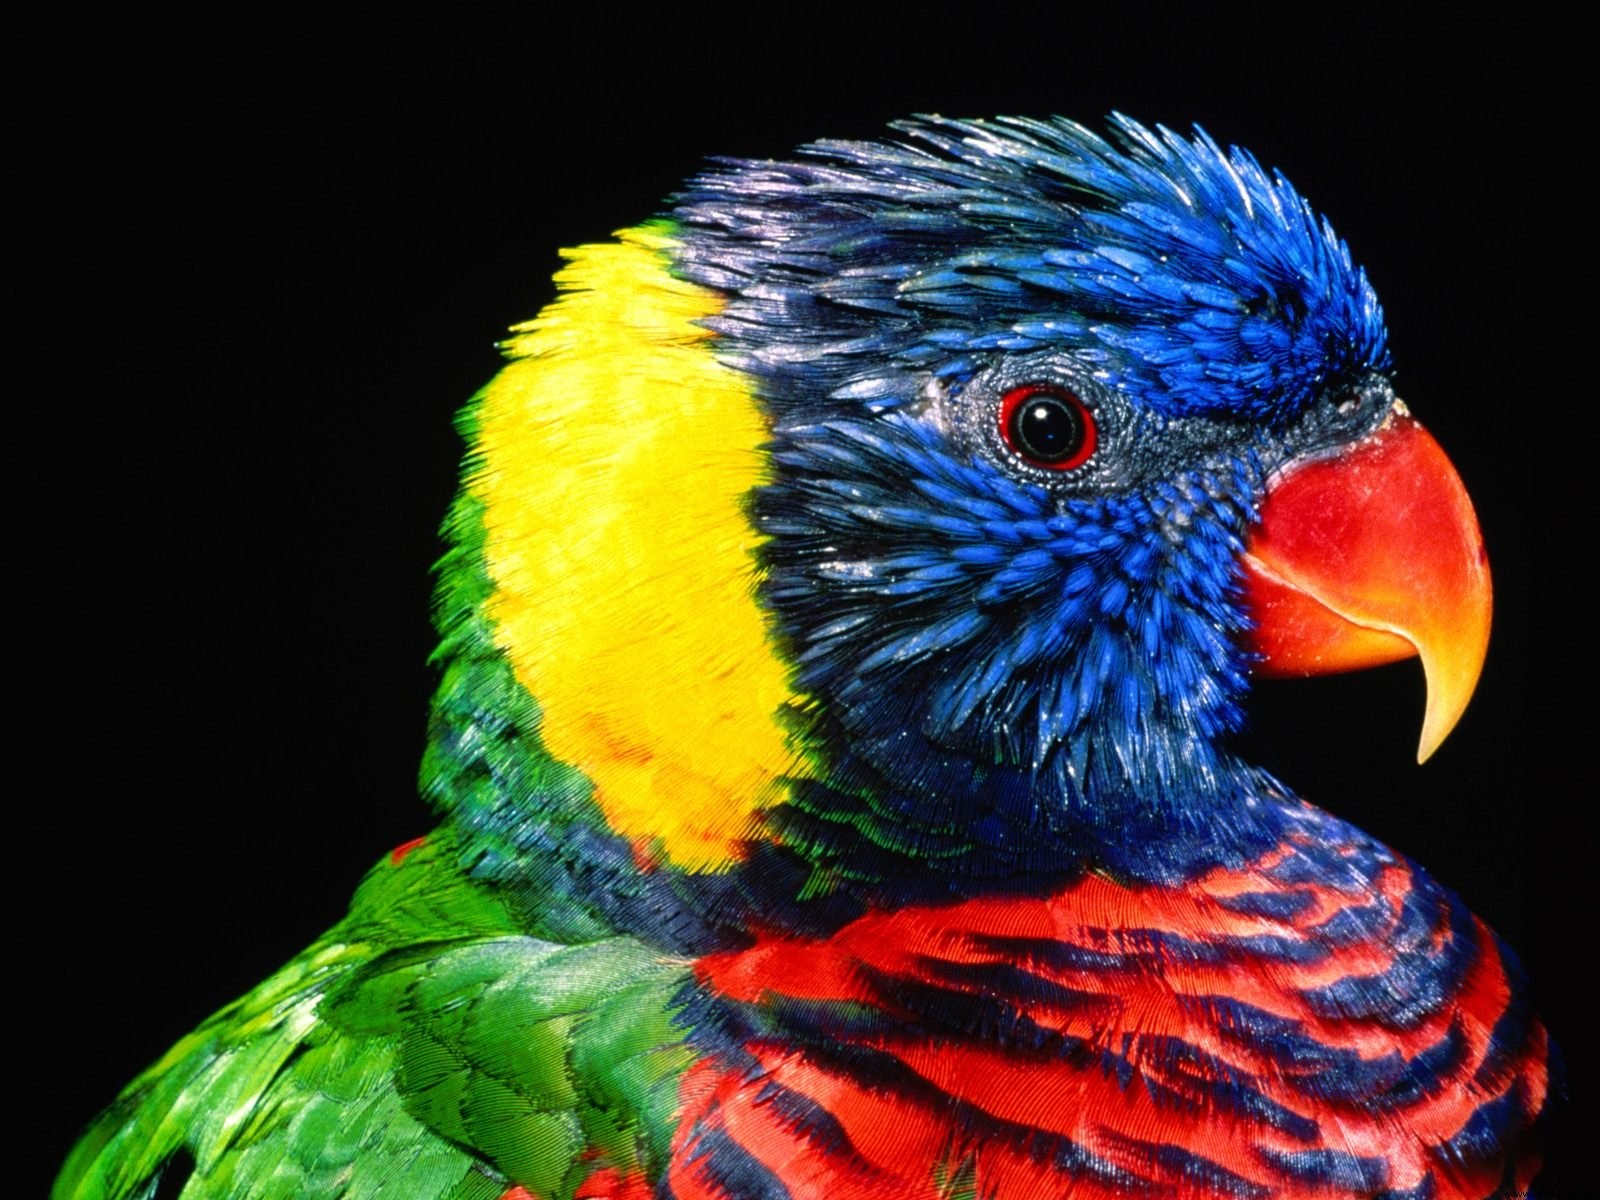 Rainbow Colorful Parrot Bird Wallpaper HD Wallpapers 1600x1200